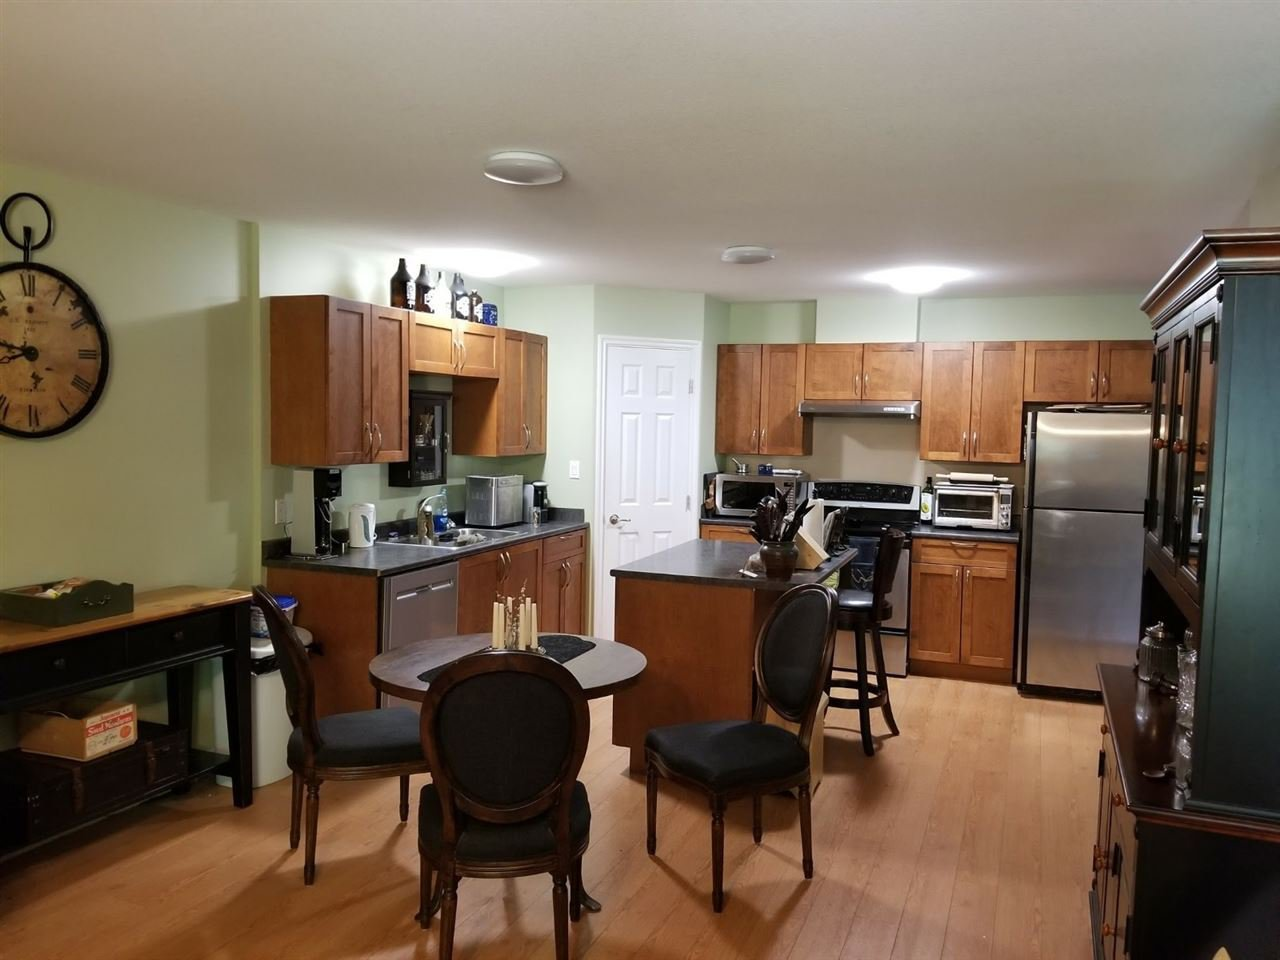 Photo 3: Photos: 5664 TRIDENT Avenue in Sechelt: Sechelt District House for sale (Sunshine Coast)  : MLS®# R2370476